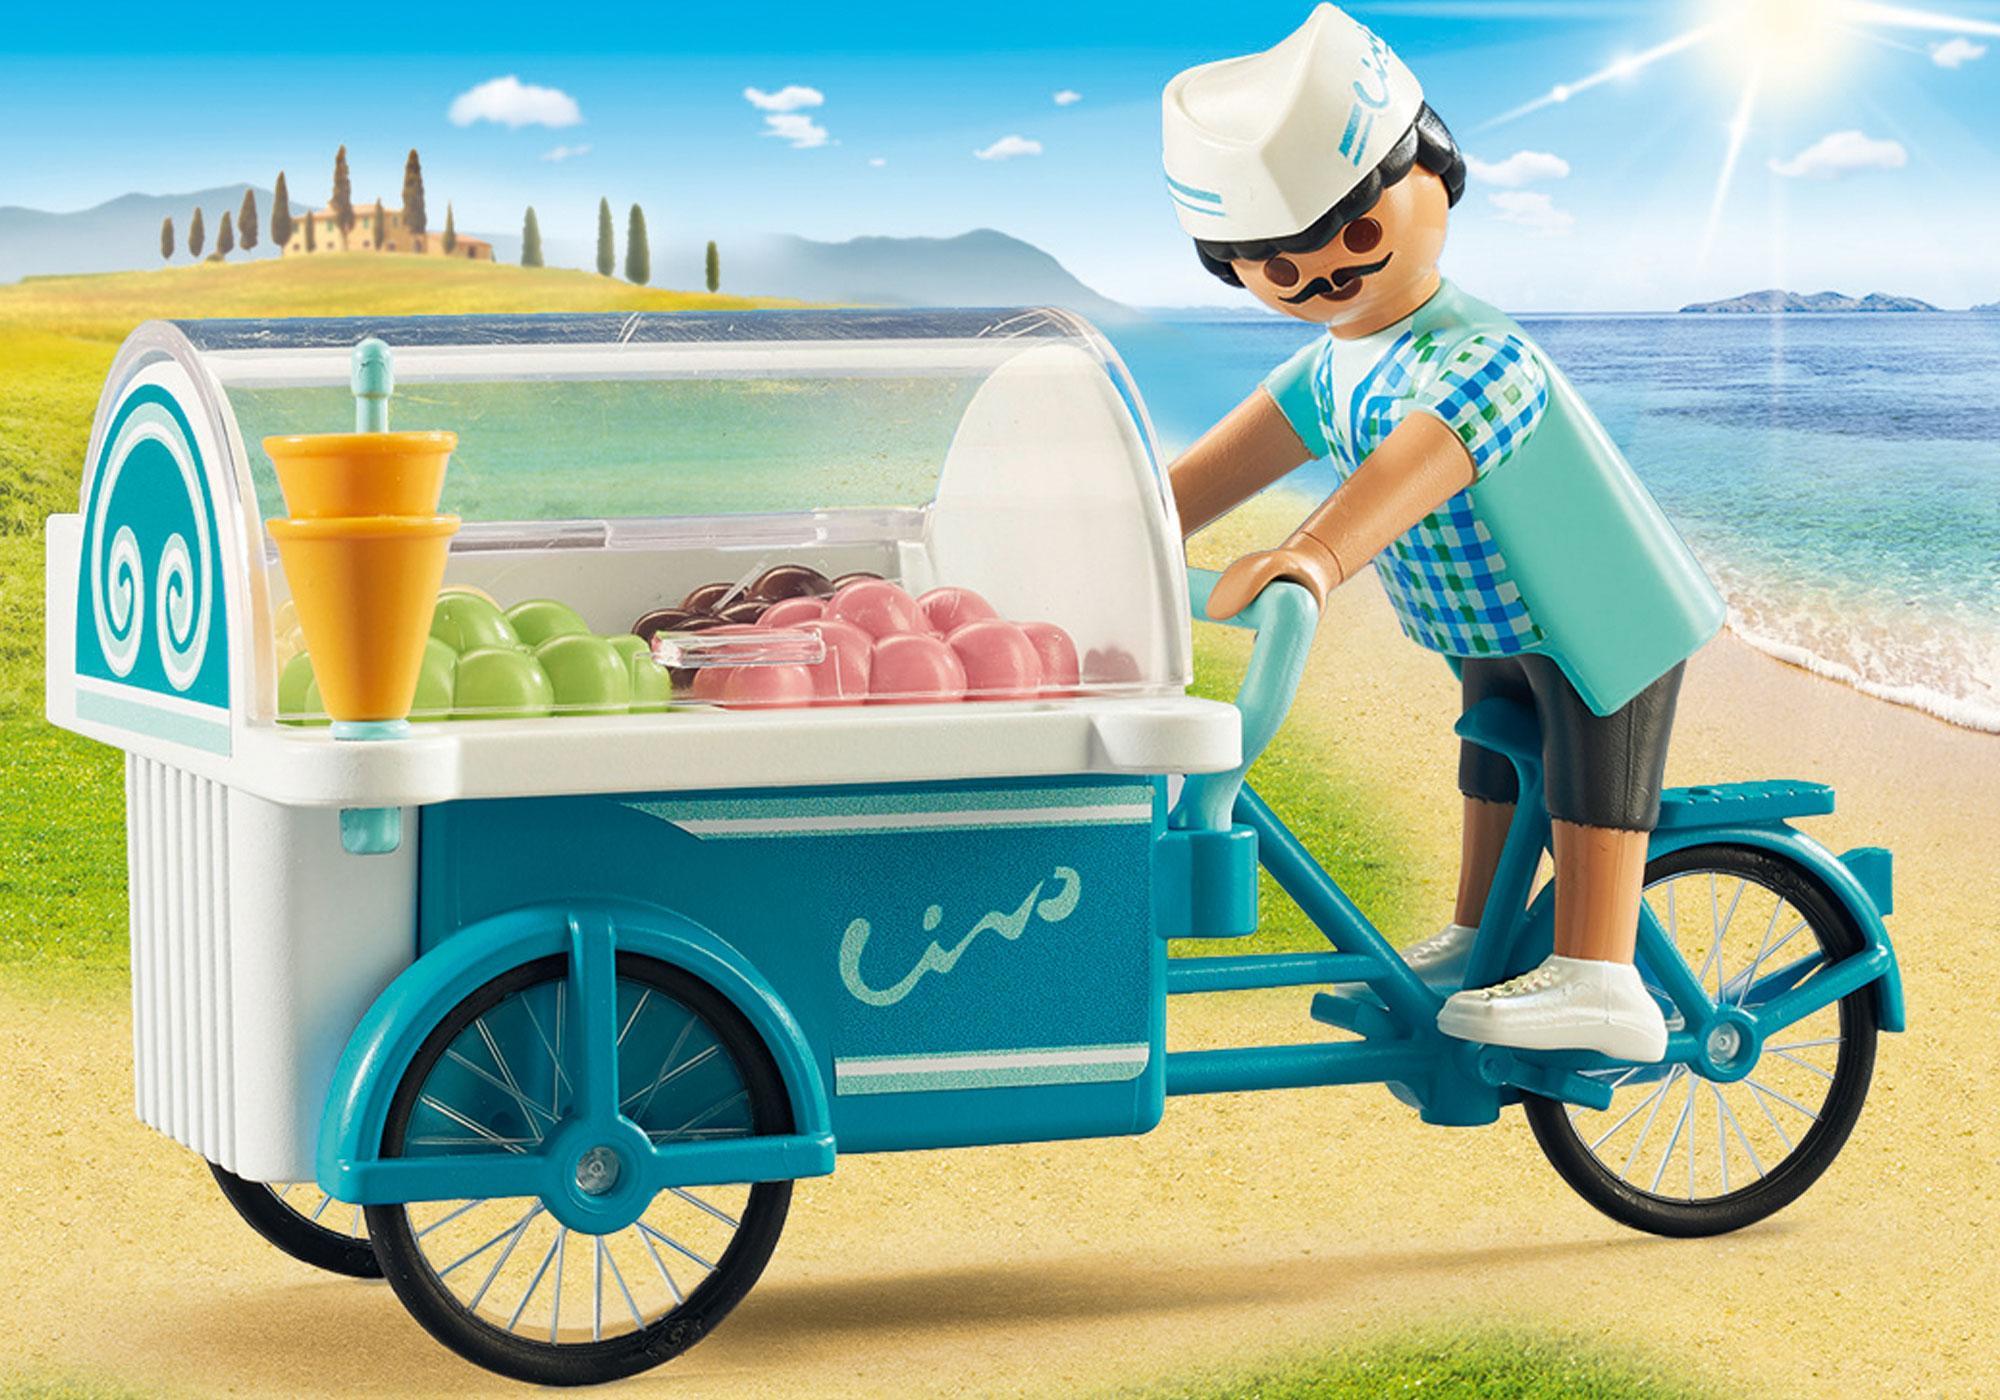 http://media.playmobil.com/i/playmobil/9426_product_extra1/Fahrrad mit Eiswagen